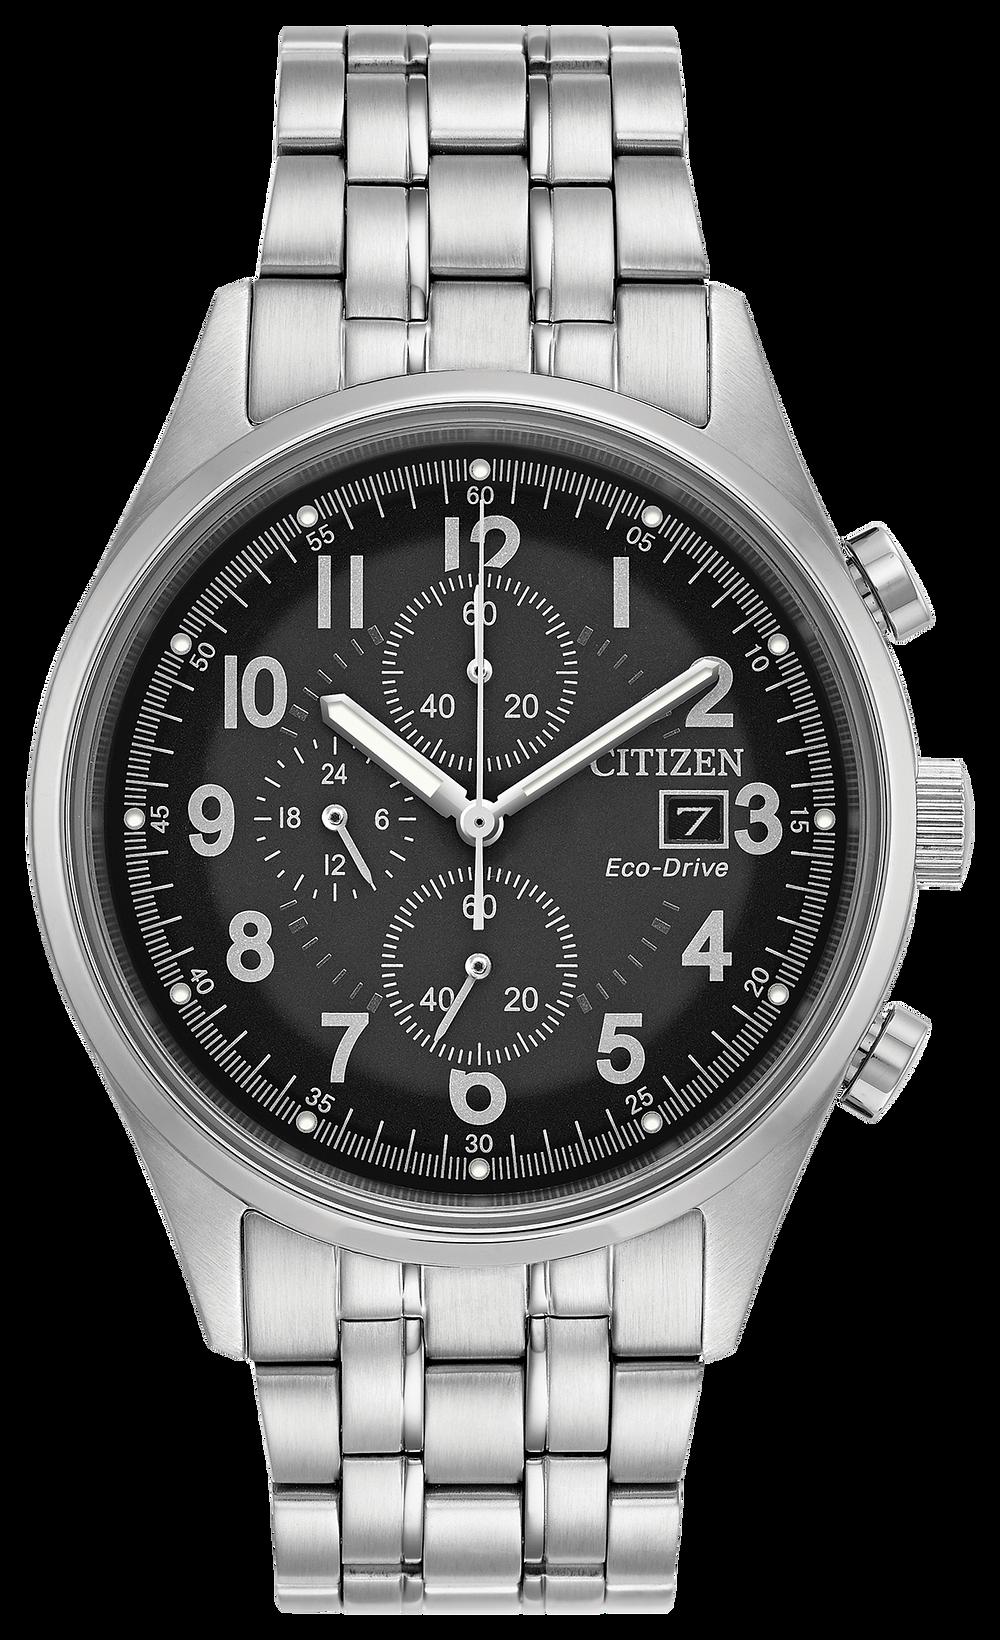 b8035a051 Chandler - Men's Eco-Drive Silver Steel Chronograph Date Watch | Citizen